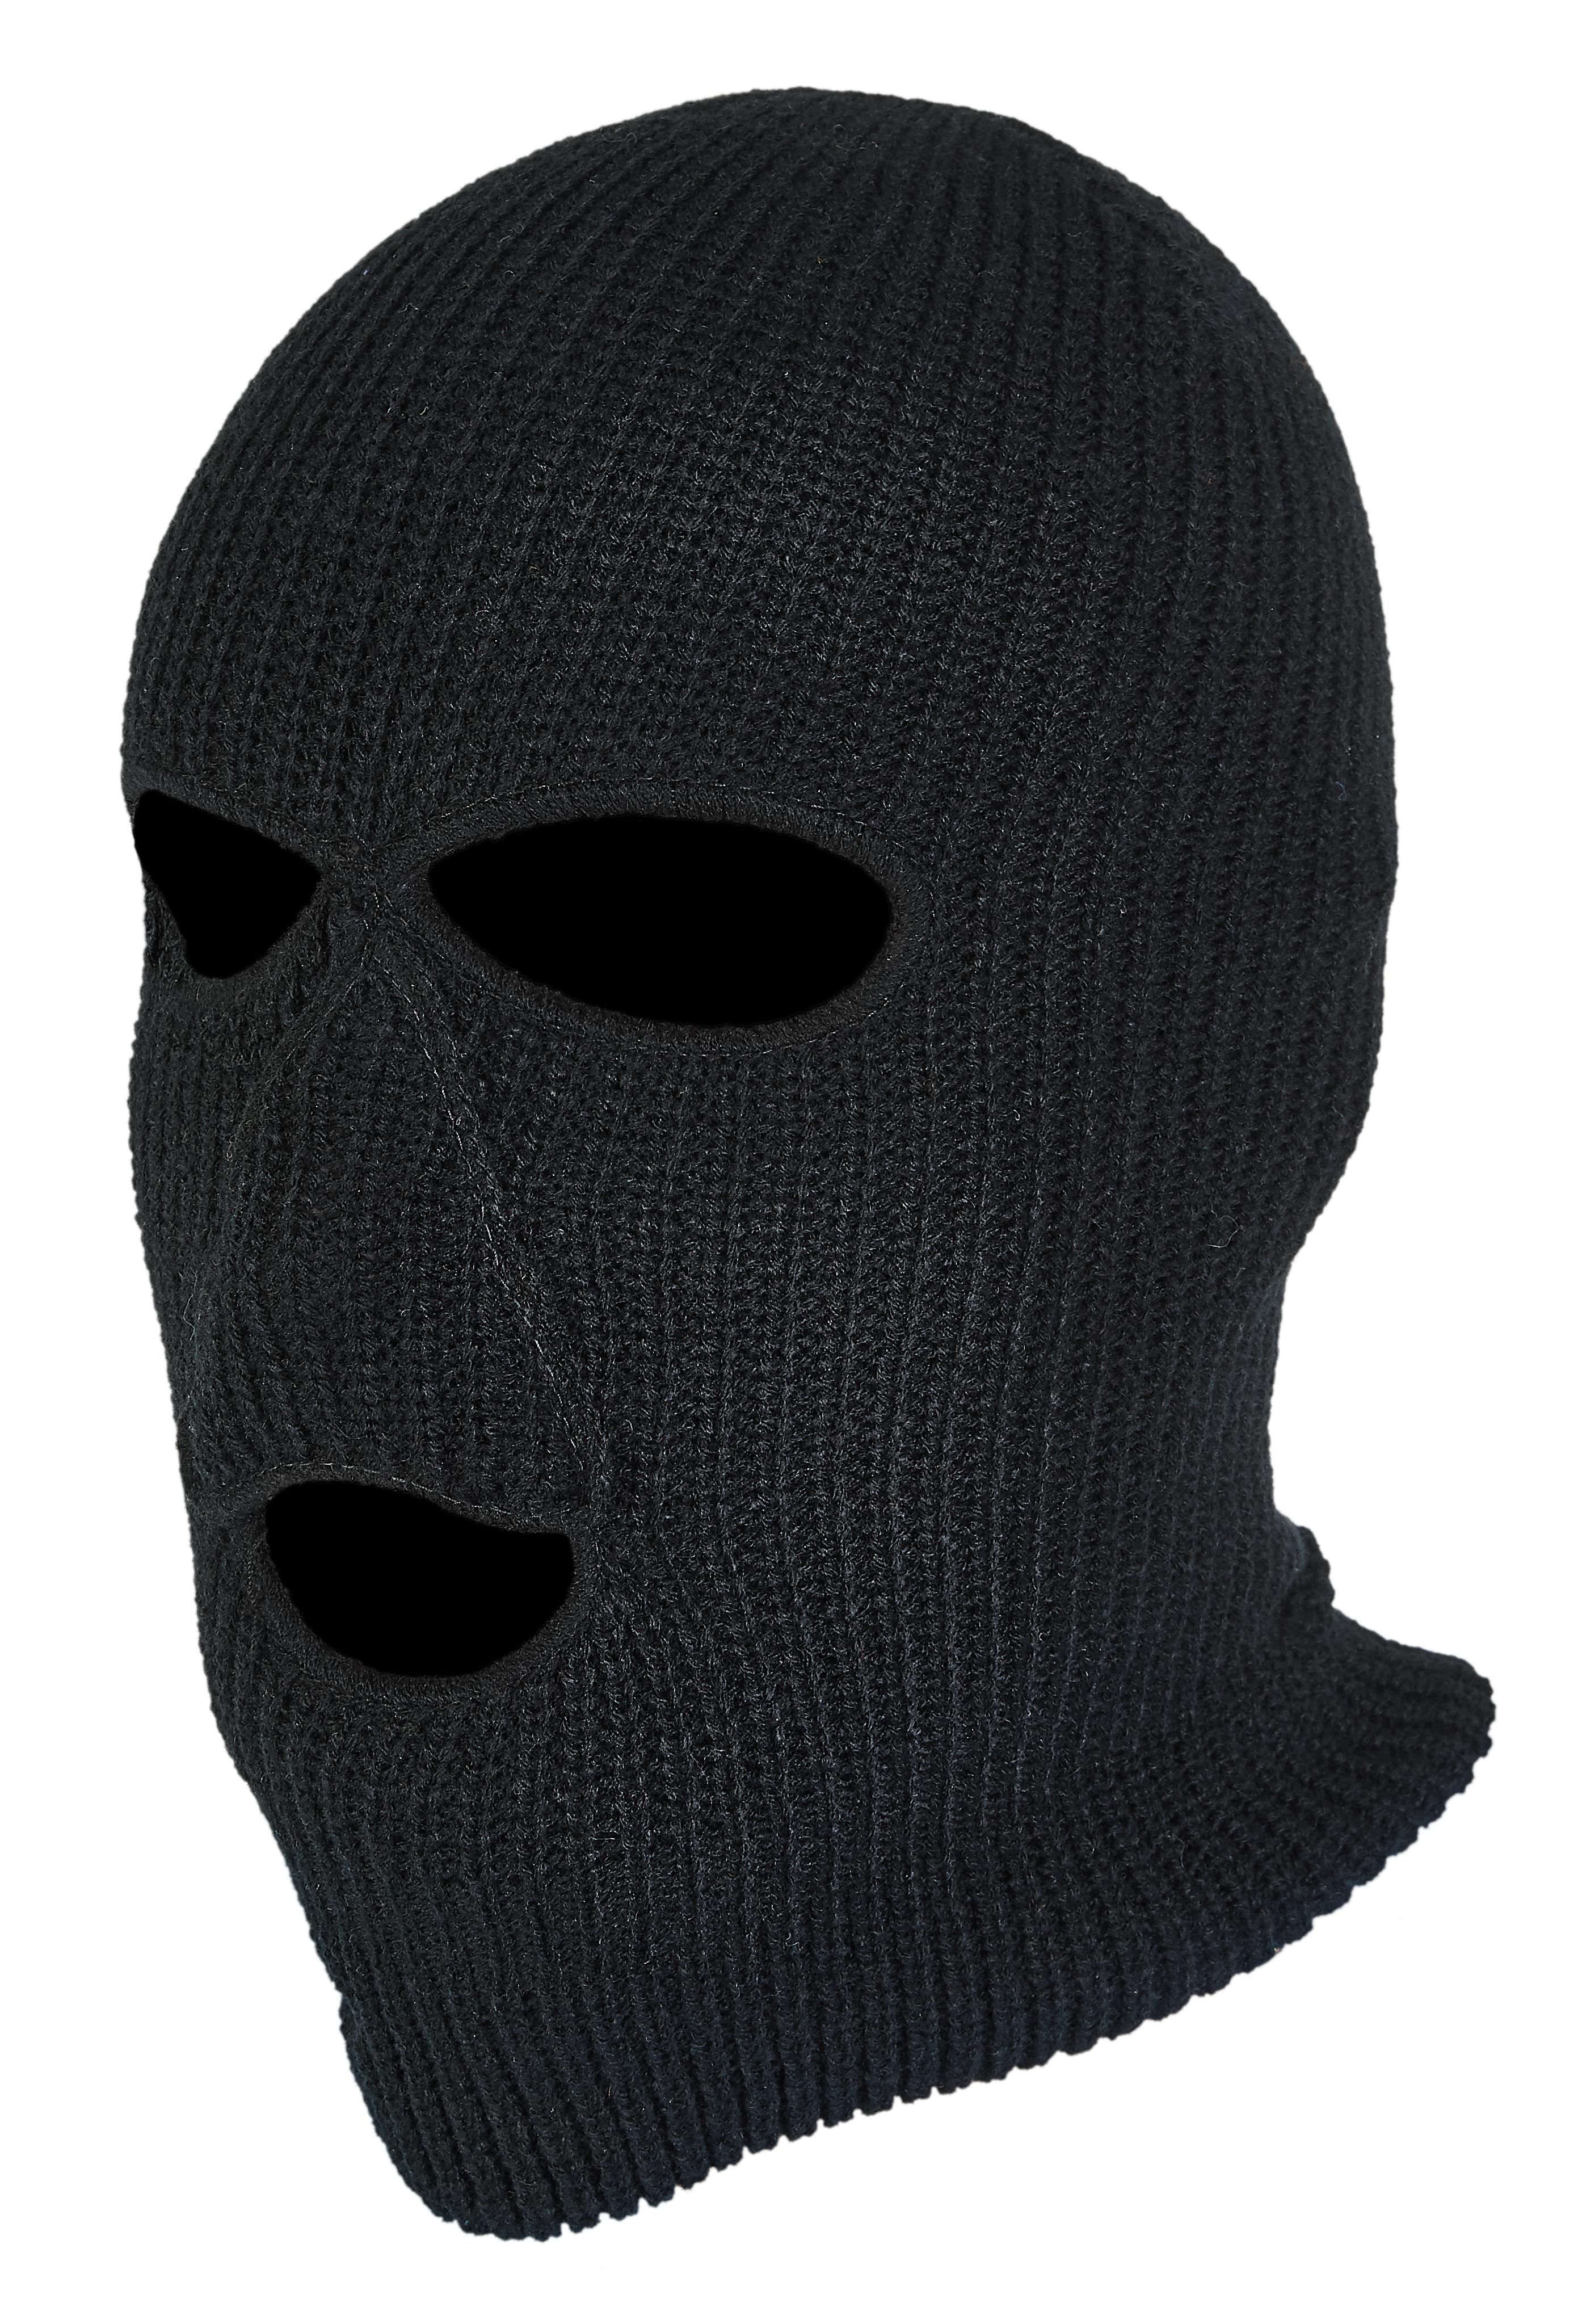 Norfin kukla Hat-Mask Knitted  Black vel. XL